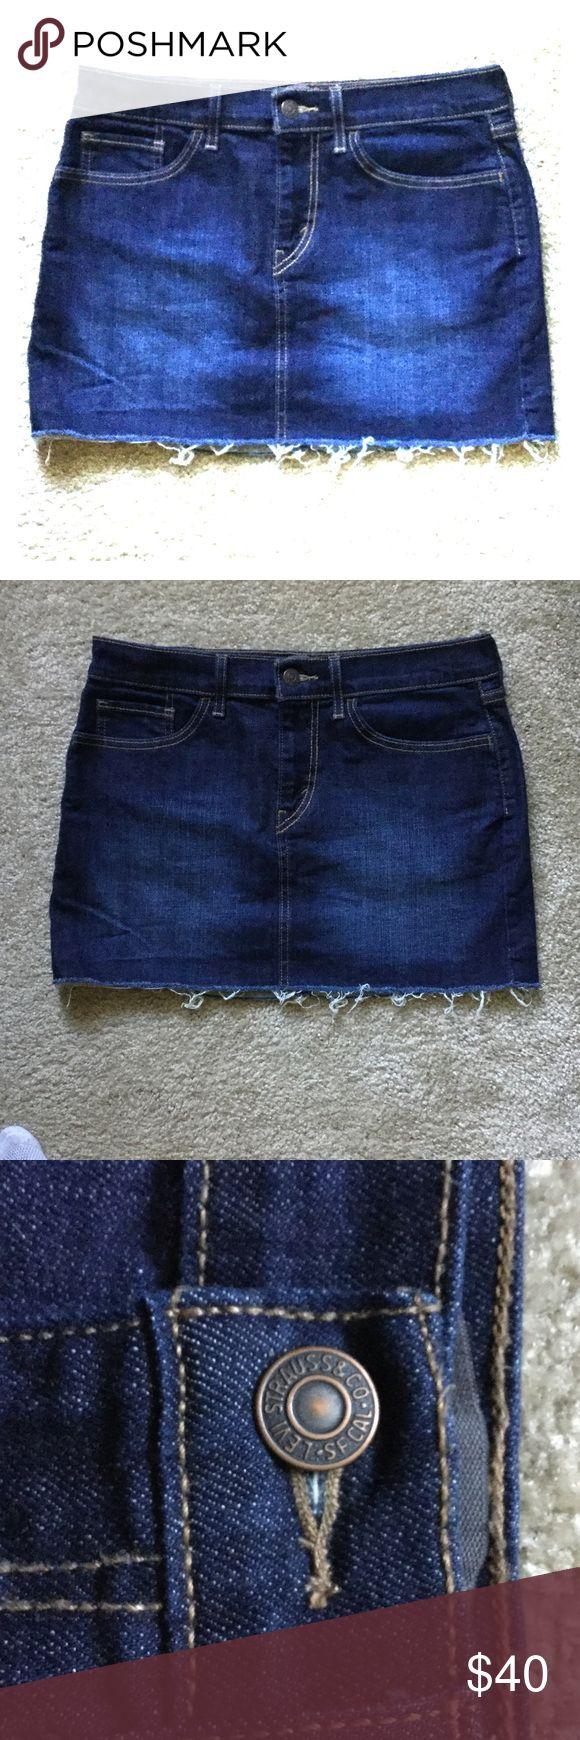 ❤️PRICE DROPPED 🎉Mini Levi Skirt 💙 Never Worn 💙 Levi Jeans Mini Skirt. Super Cute. 13 Inches from Waist to Hem. Levi's Skirts Mini